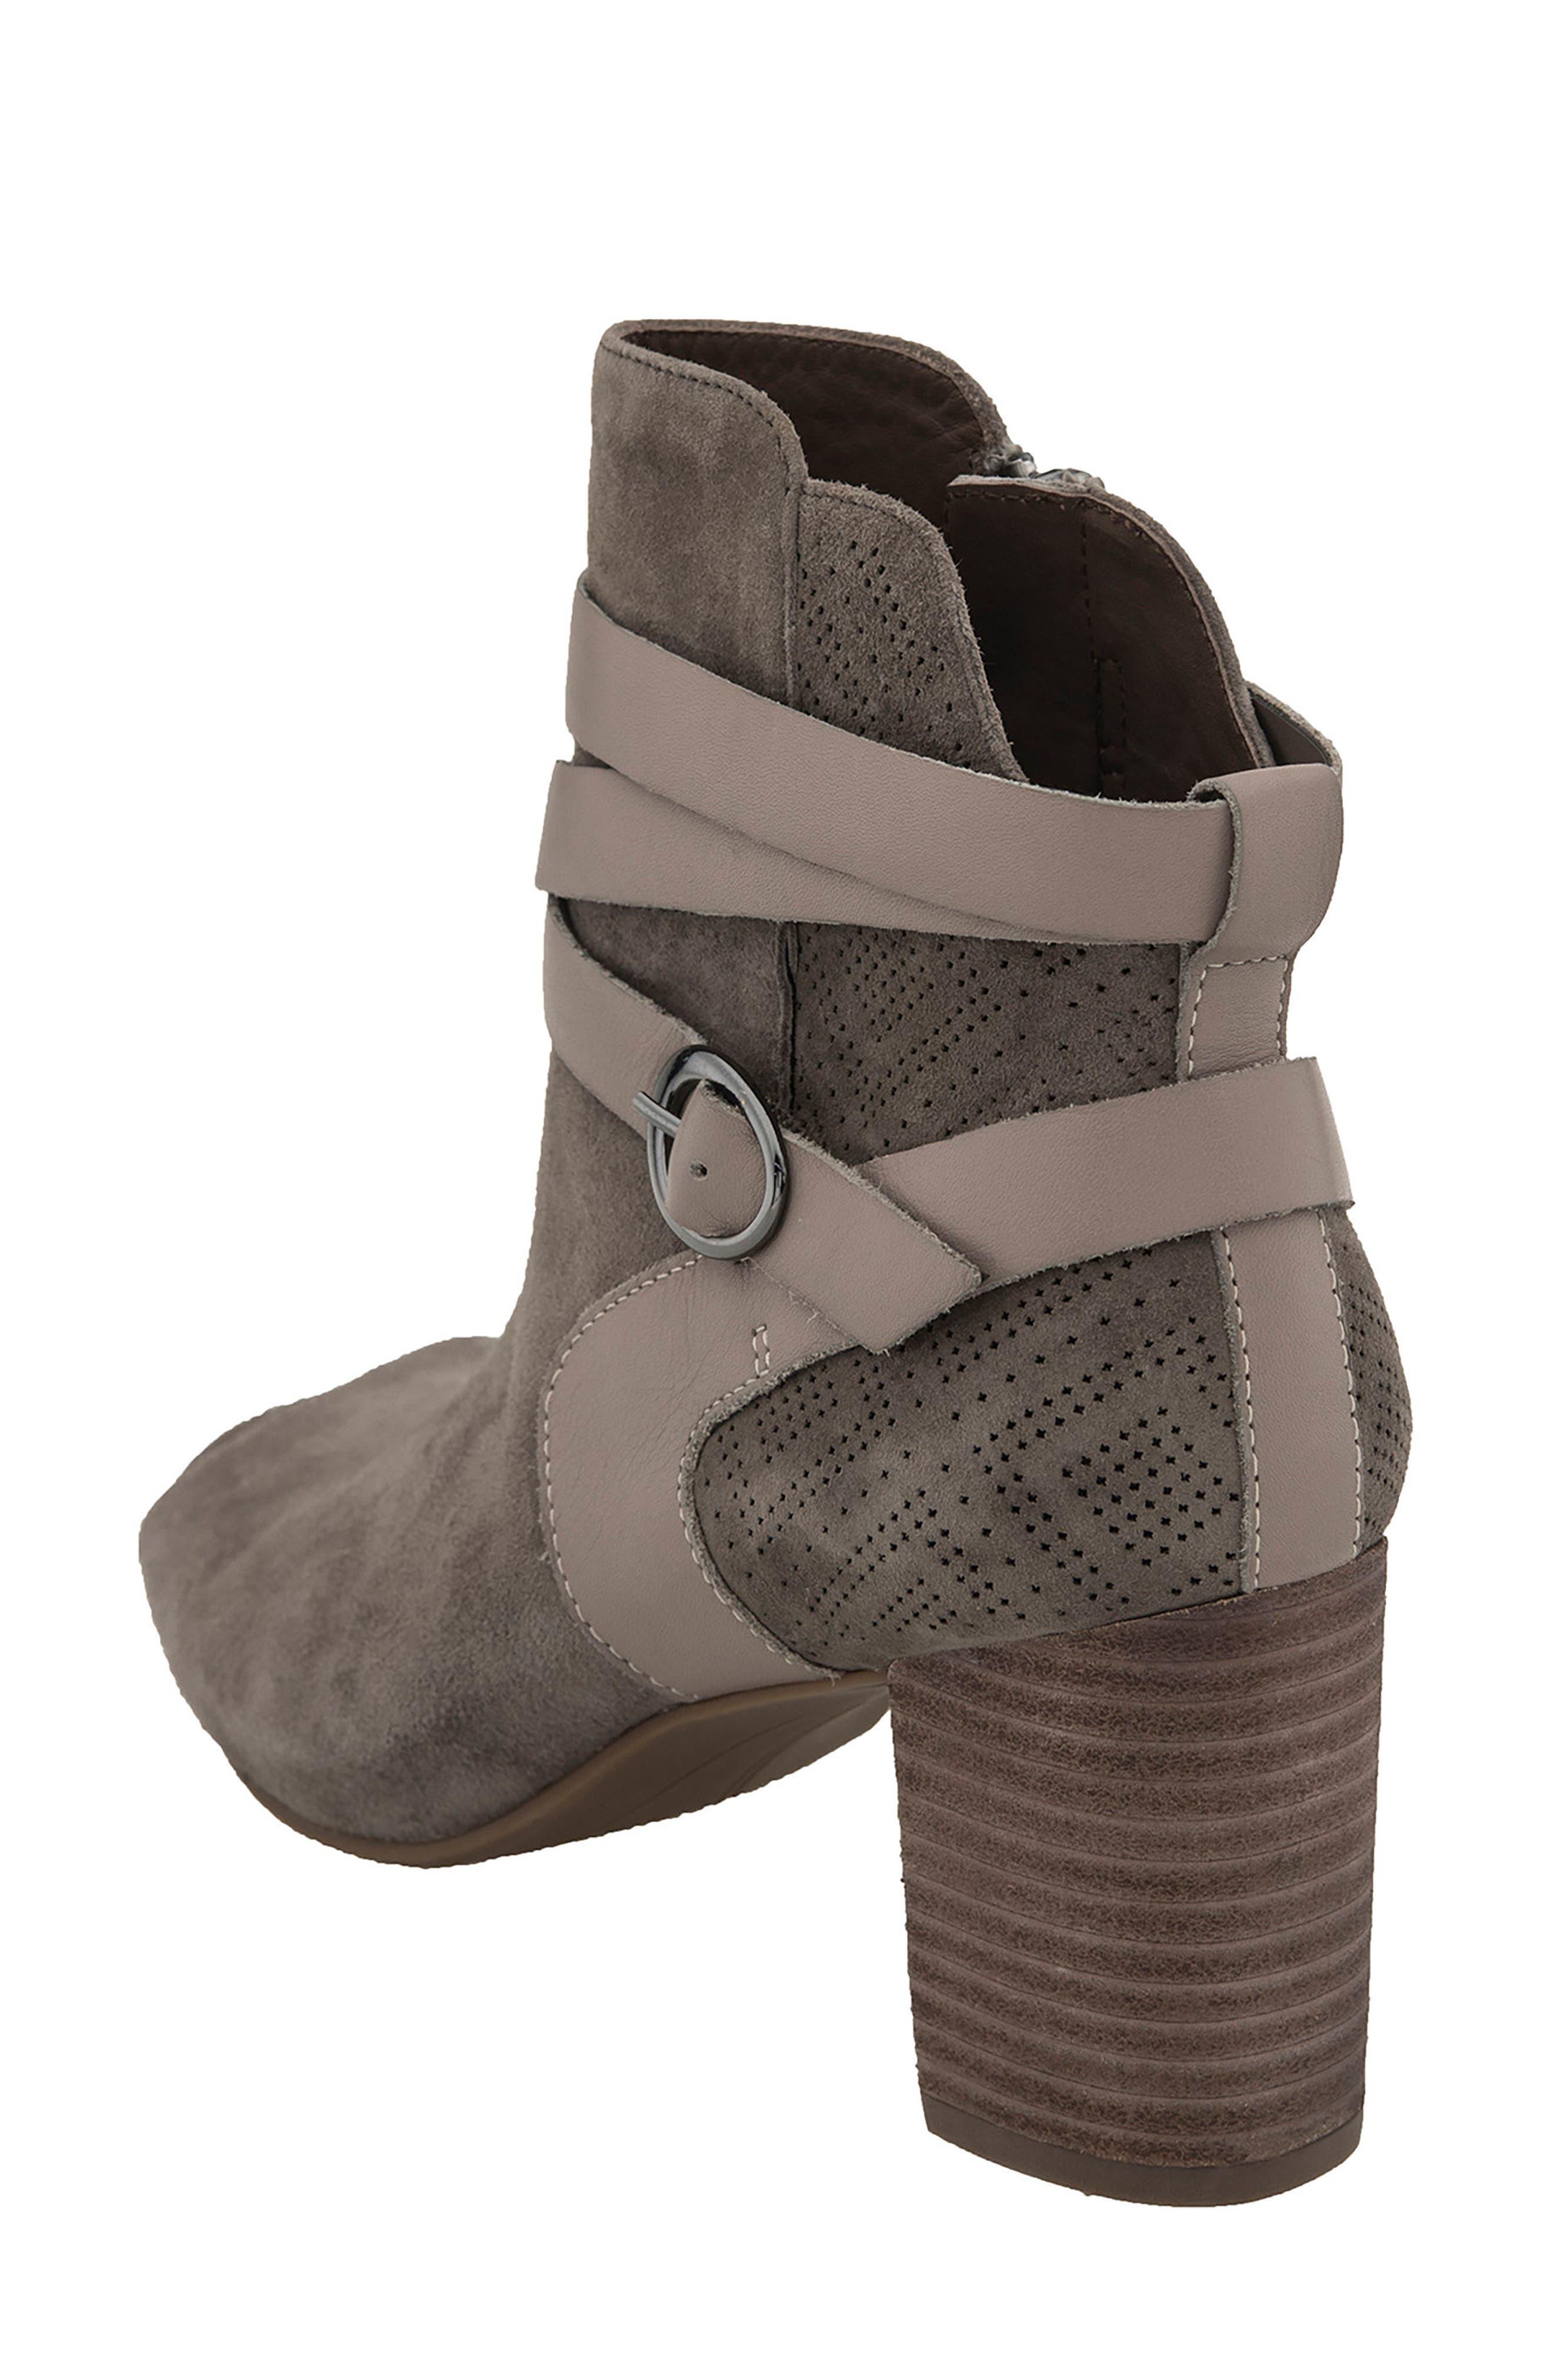 Alternate Image 3  - Earthies® Santo Strappy Peep Toe Bootie (Women)